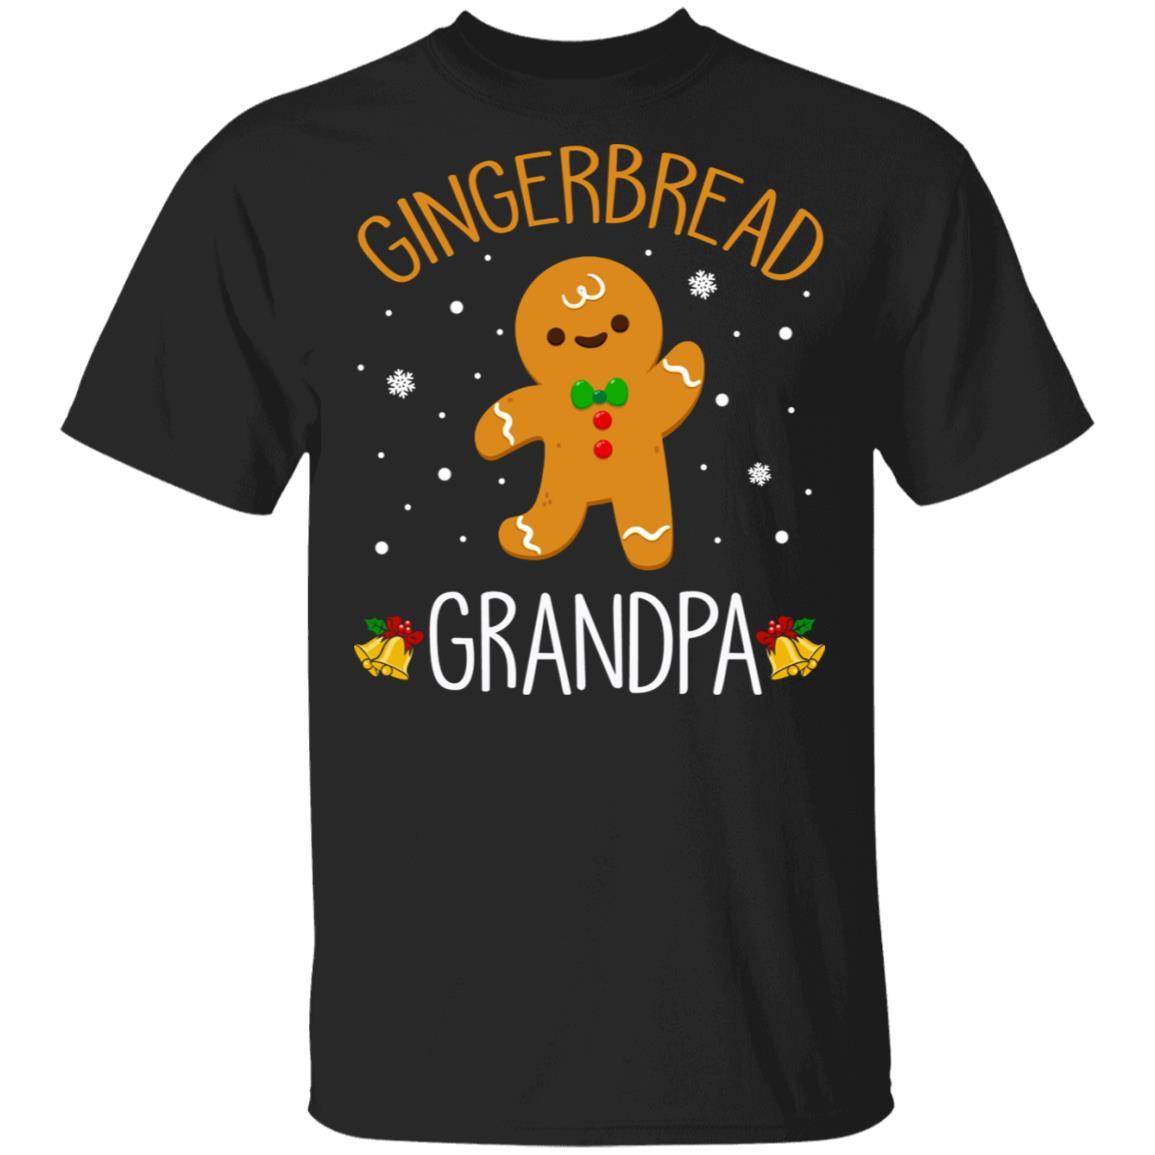 Xmas Gingerbread Men Grandpa Christmas Family Unisex Short Sleeve